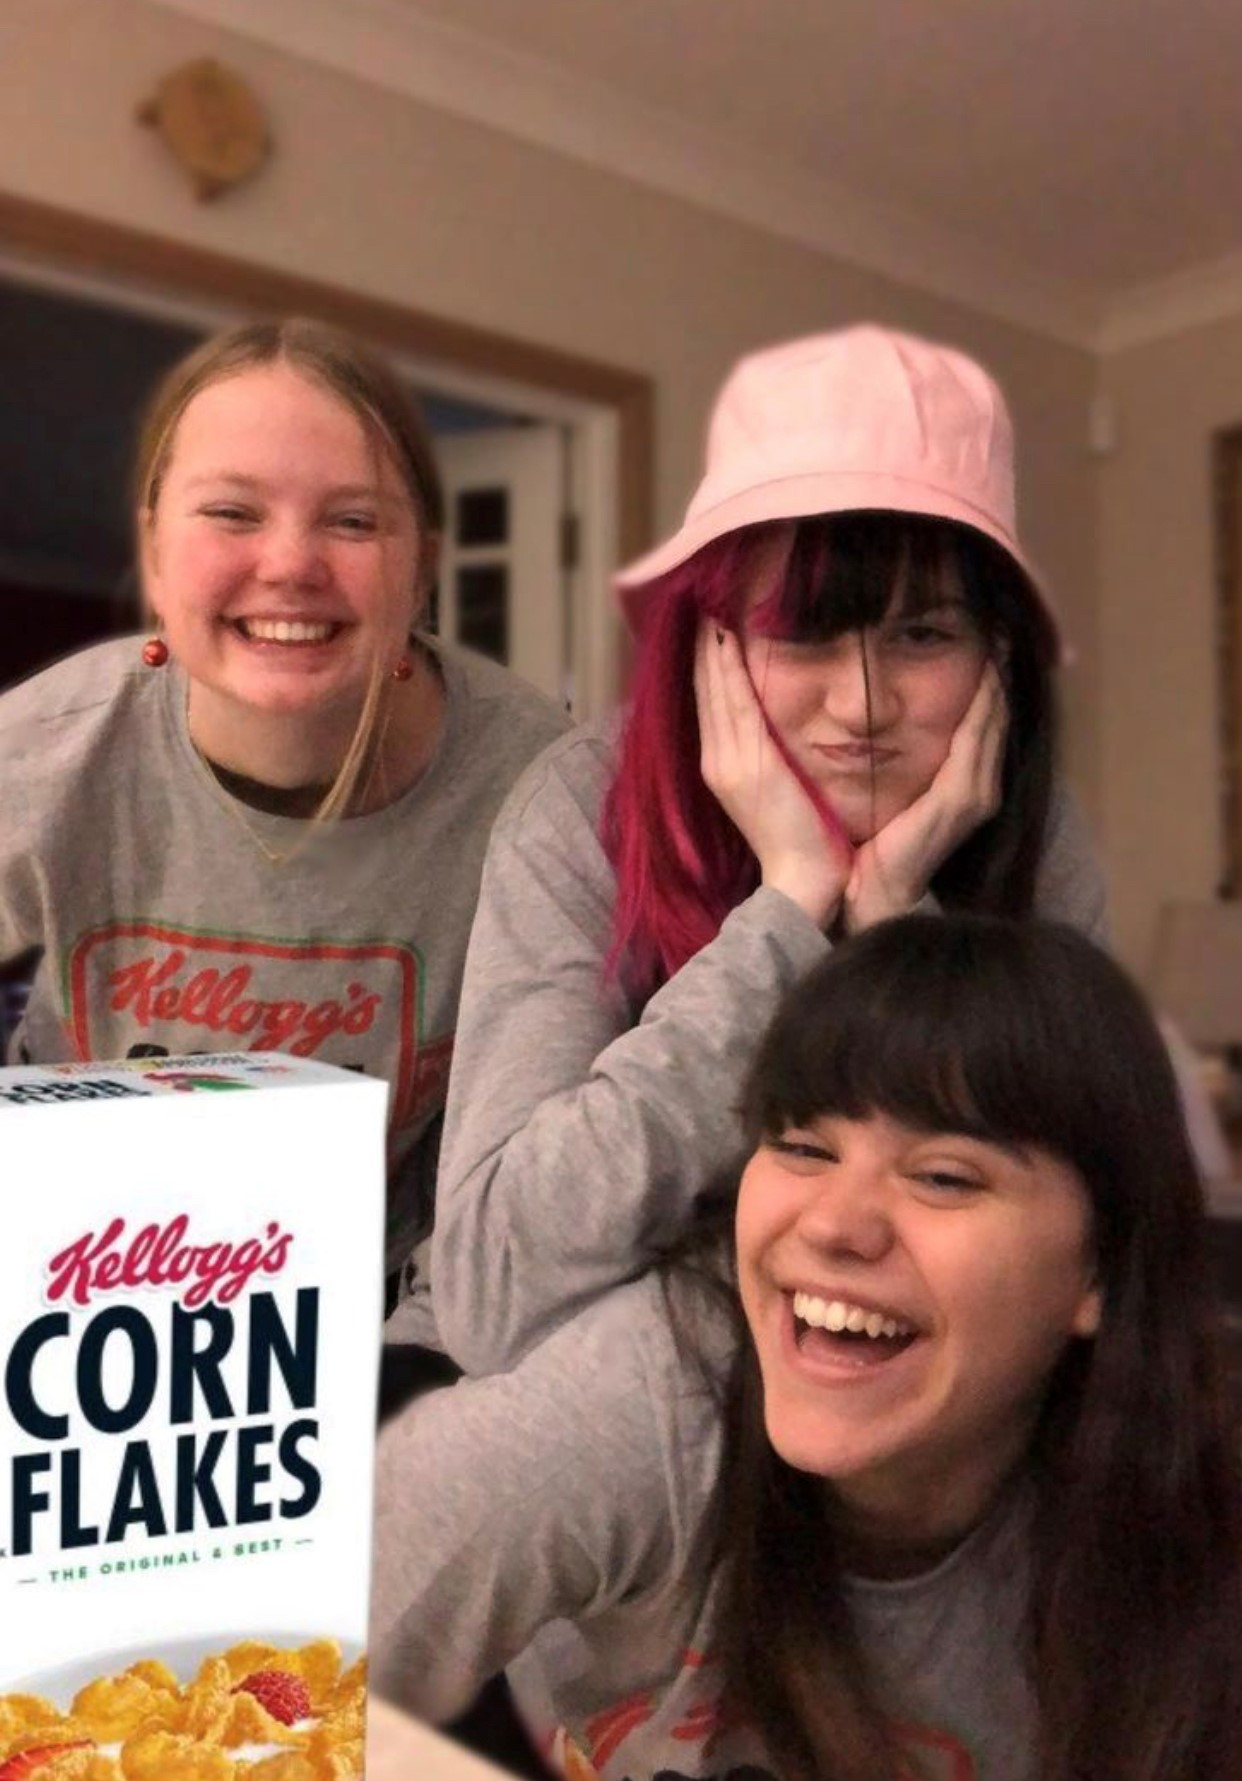 Tre jenter smiler og poserer med en Corn Flakes-eske